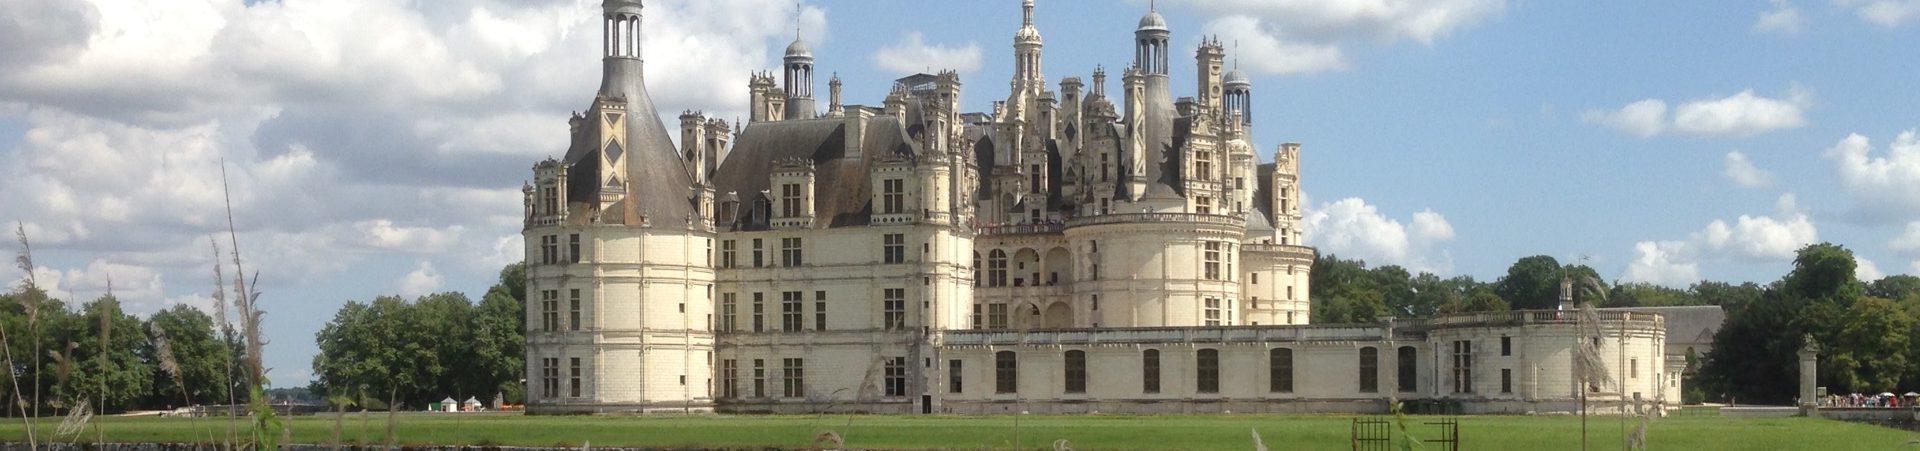 Fietsroute fietsreis fietsblog fietsverslag review fietsvakantie Loireroute kastelen